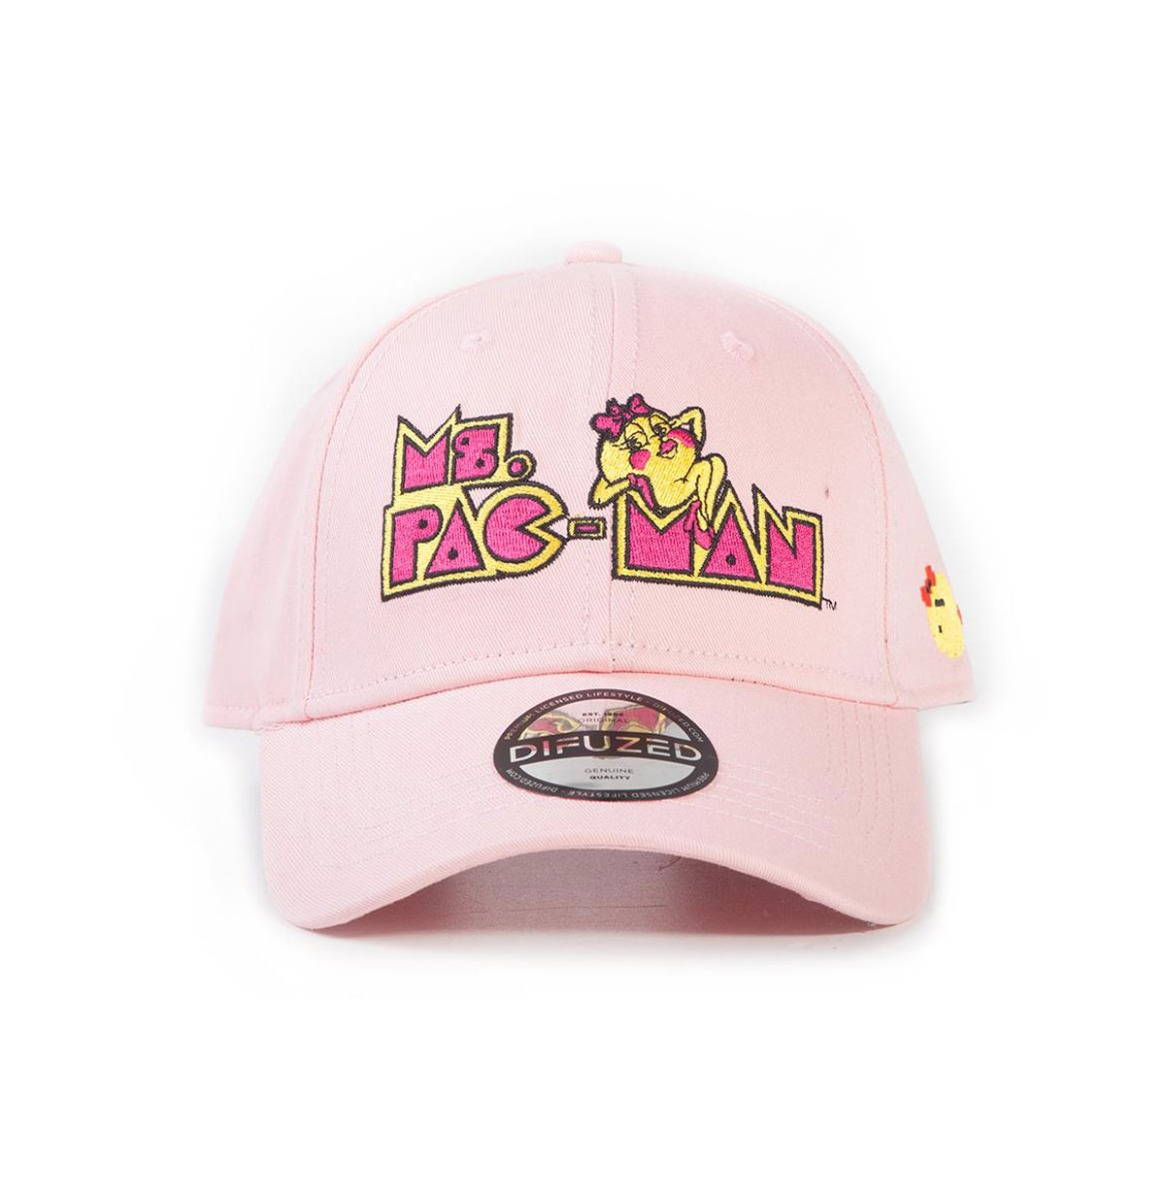 Pac-Man: Ms. Pac-Man Vintage Verstelbare Pet